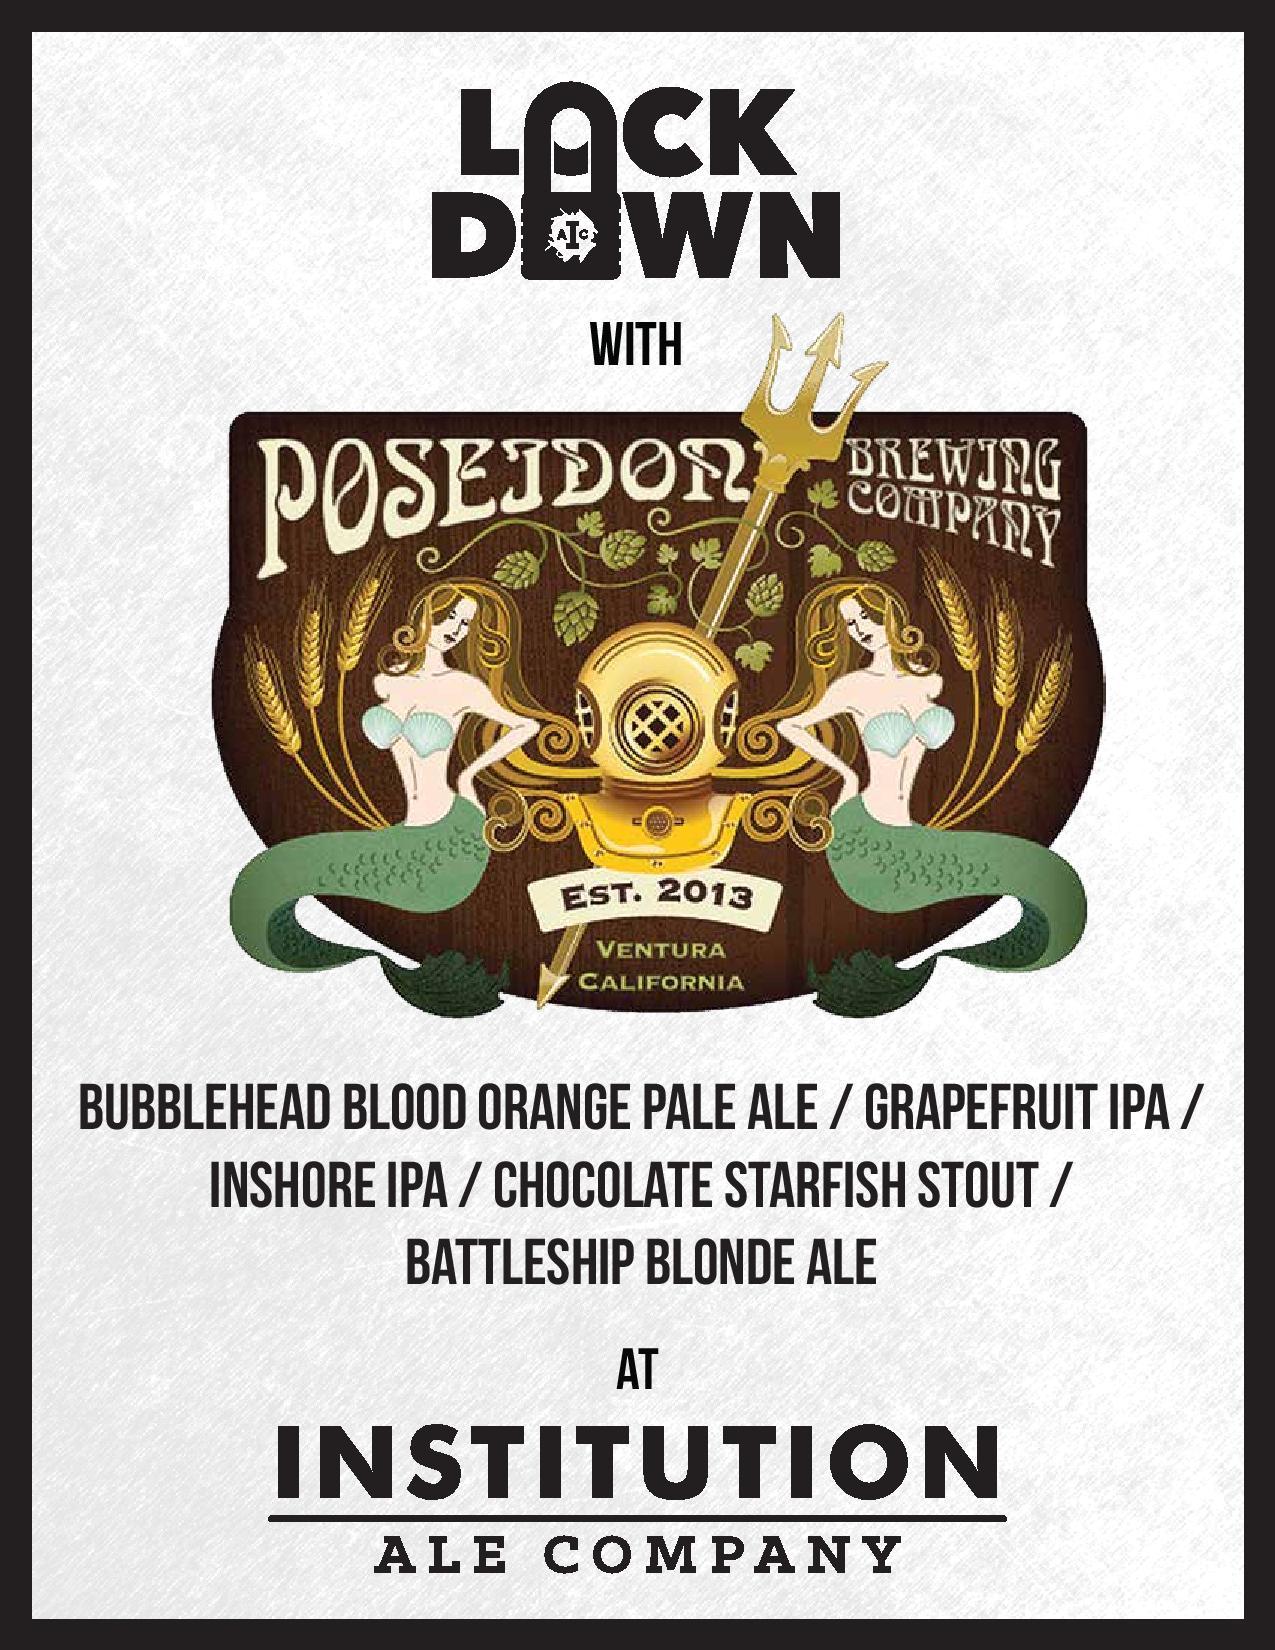 poseidon_lockdown_flyer (1)-page-001.jpg